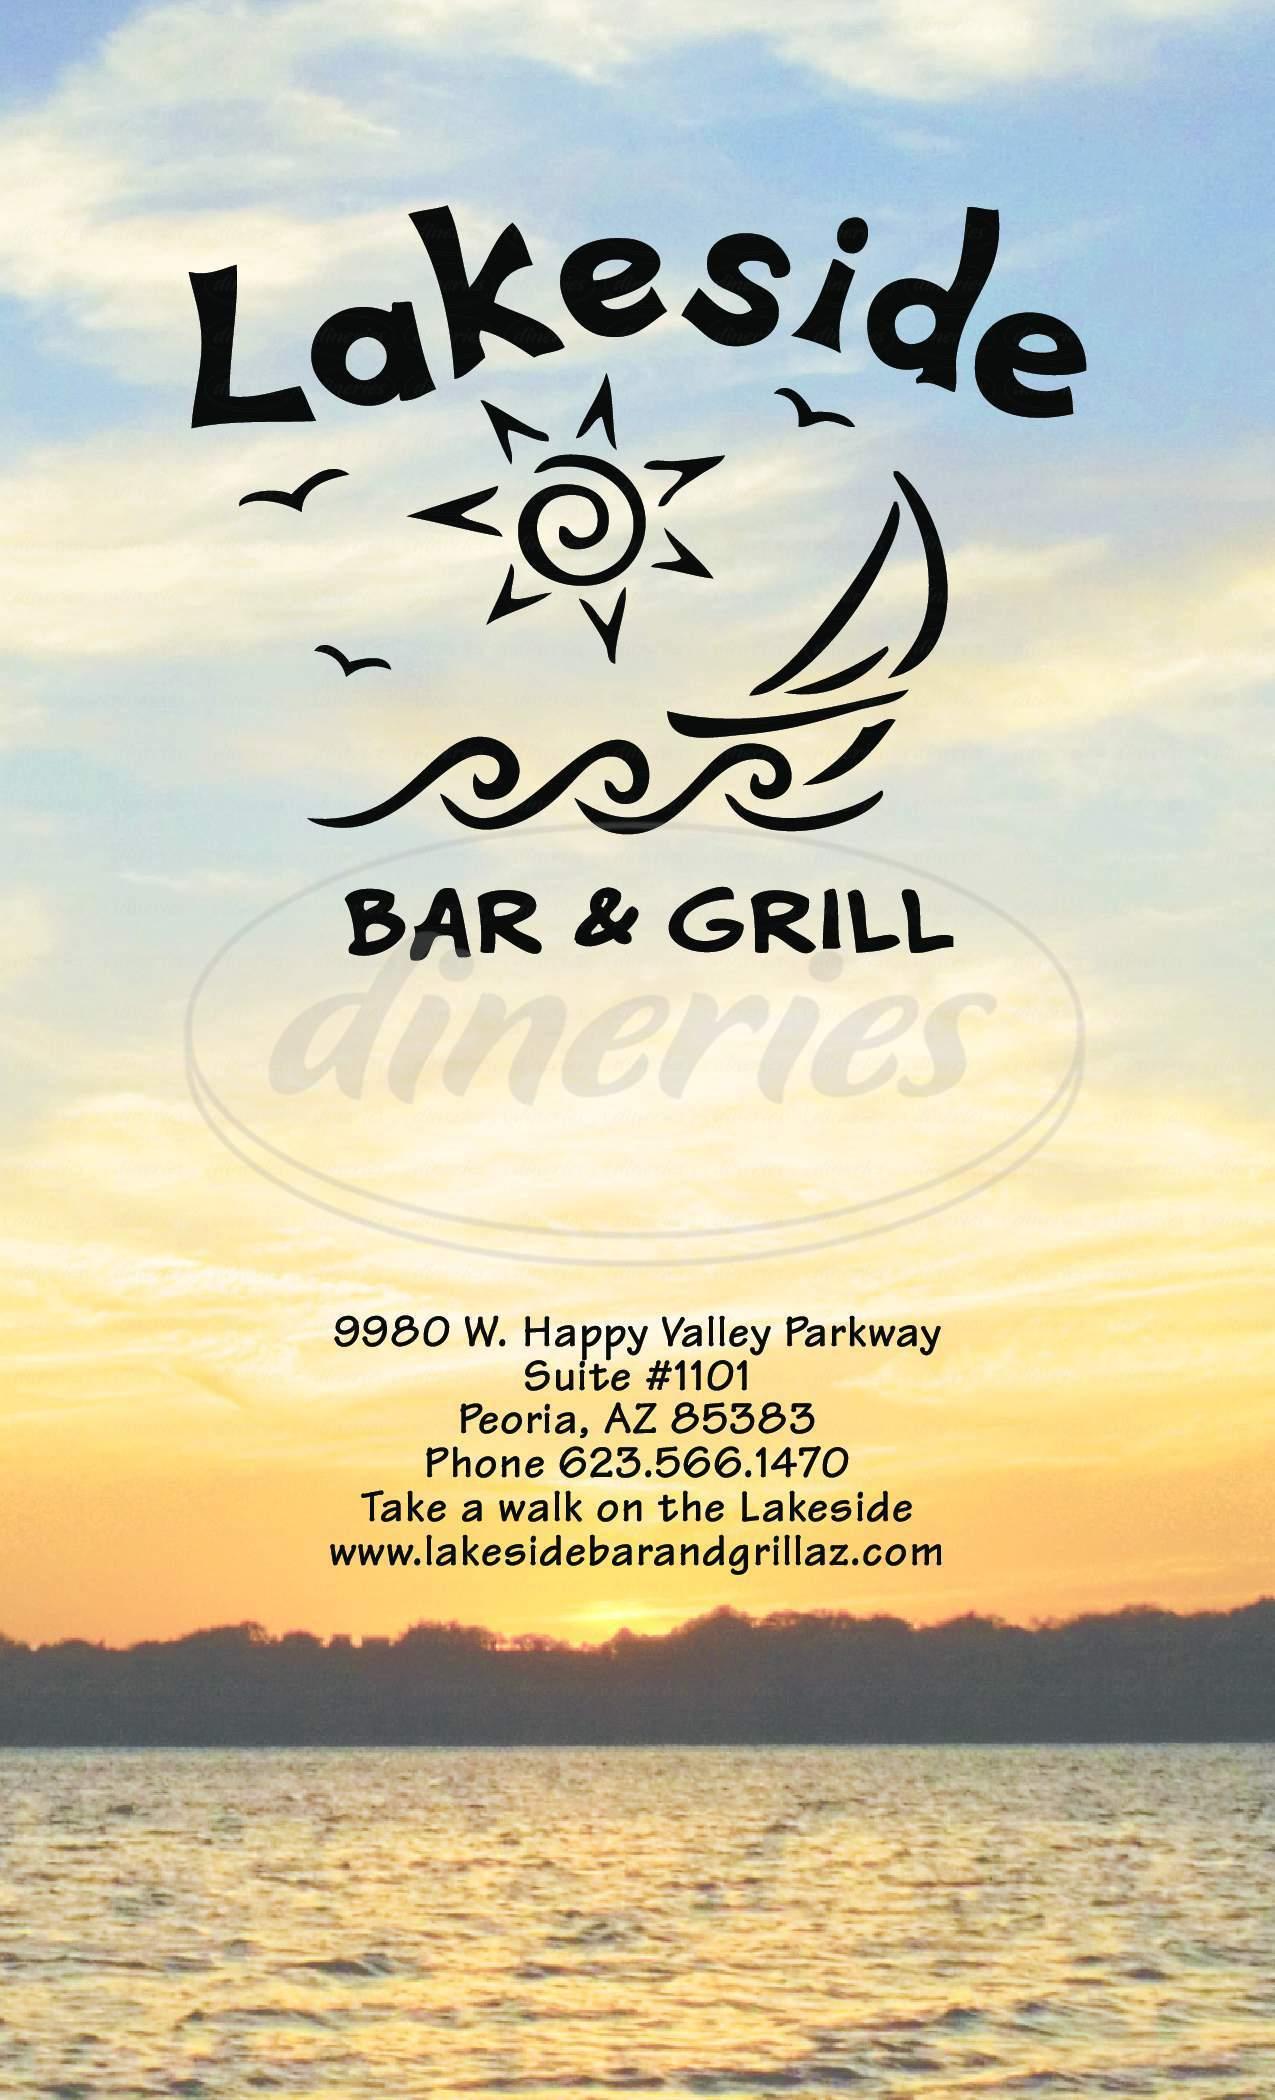 menu for Lakeside Bar & Grill